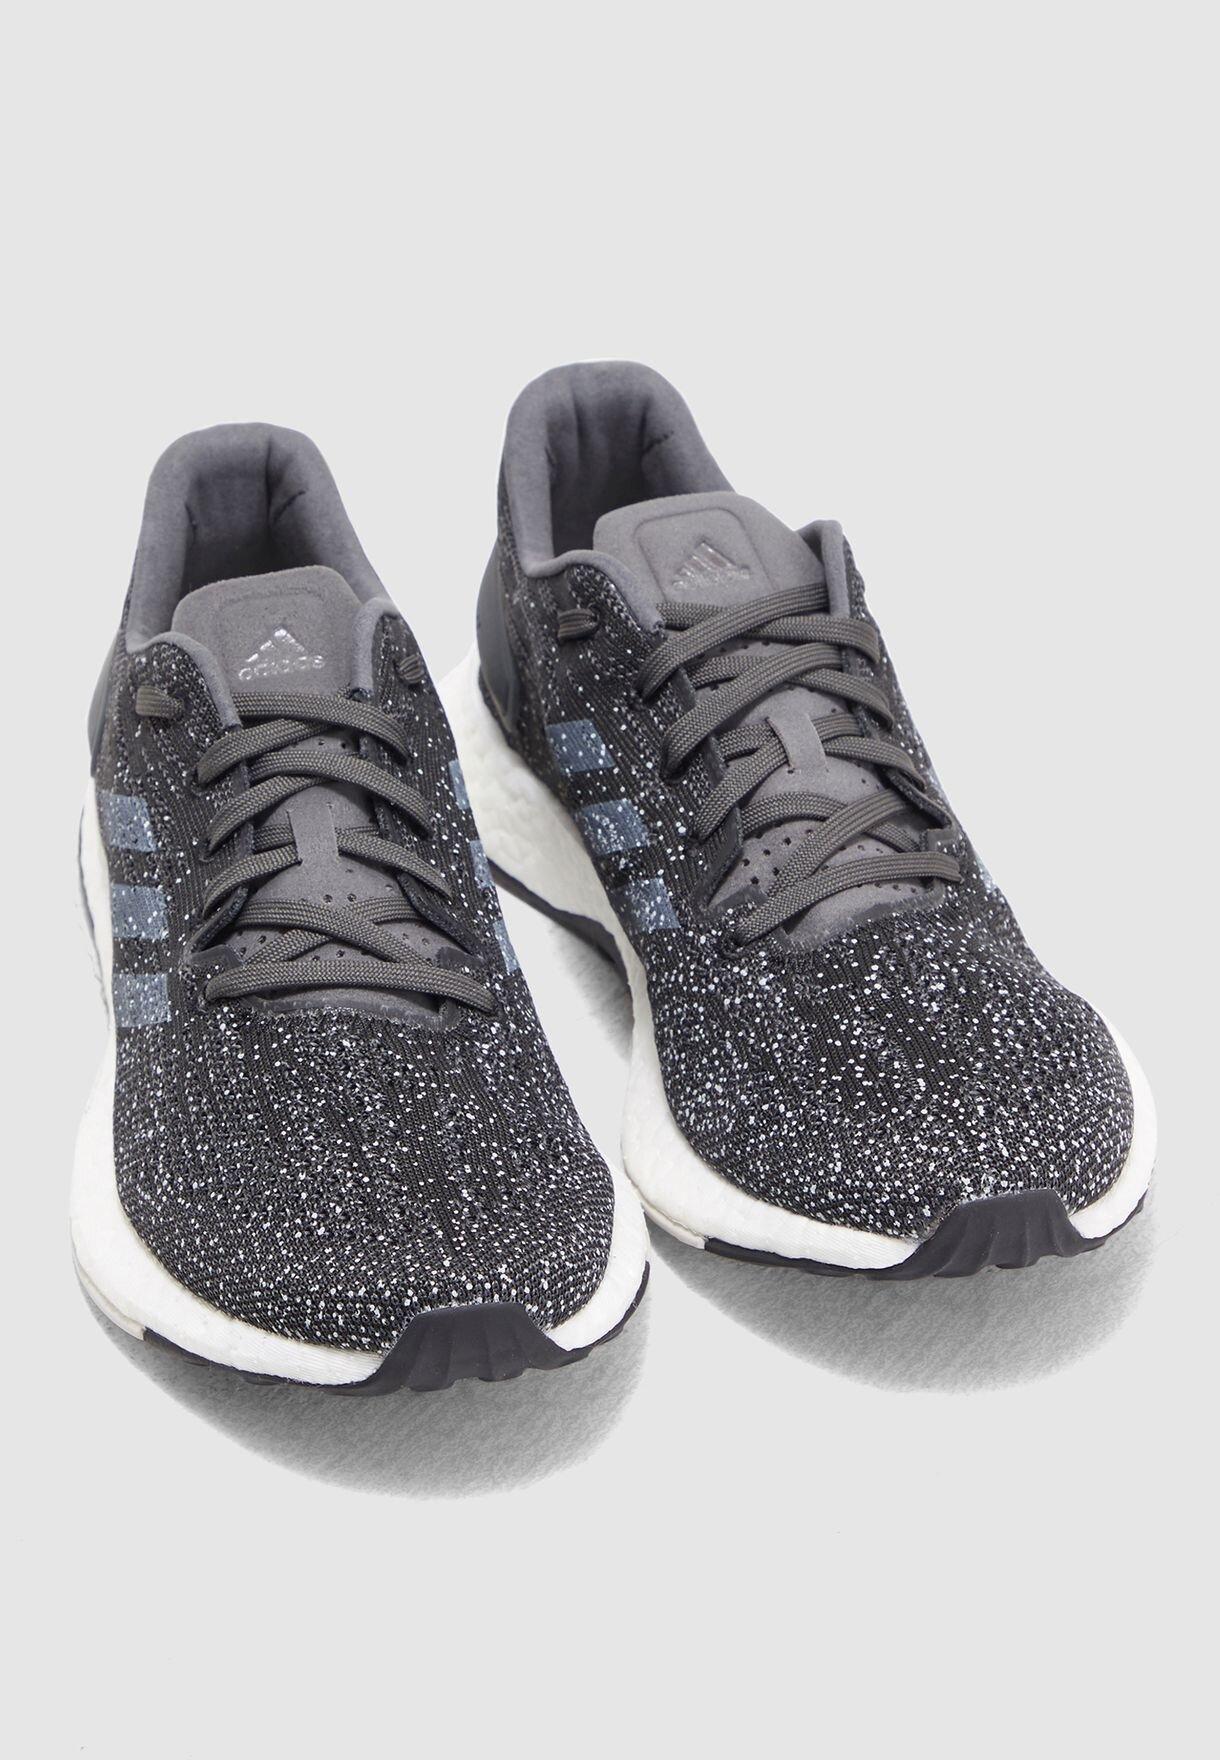 timeless design fba4c 8da95 Adidas Pure Boost DPR Womens Running Shoes